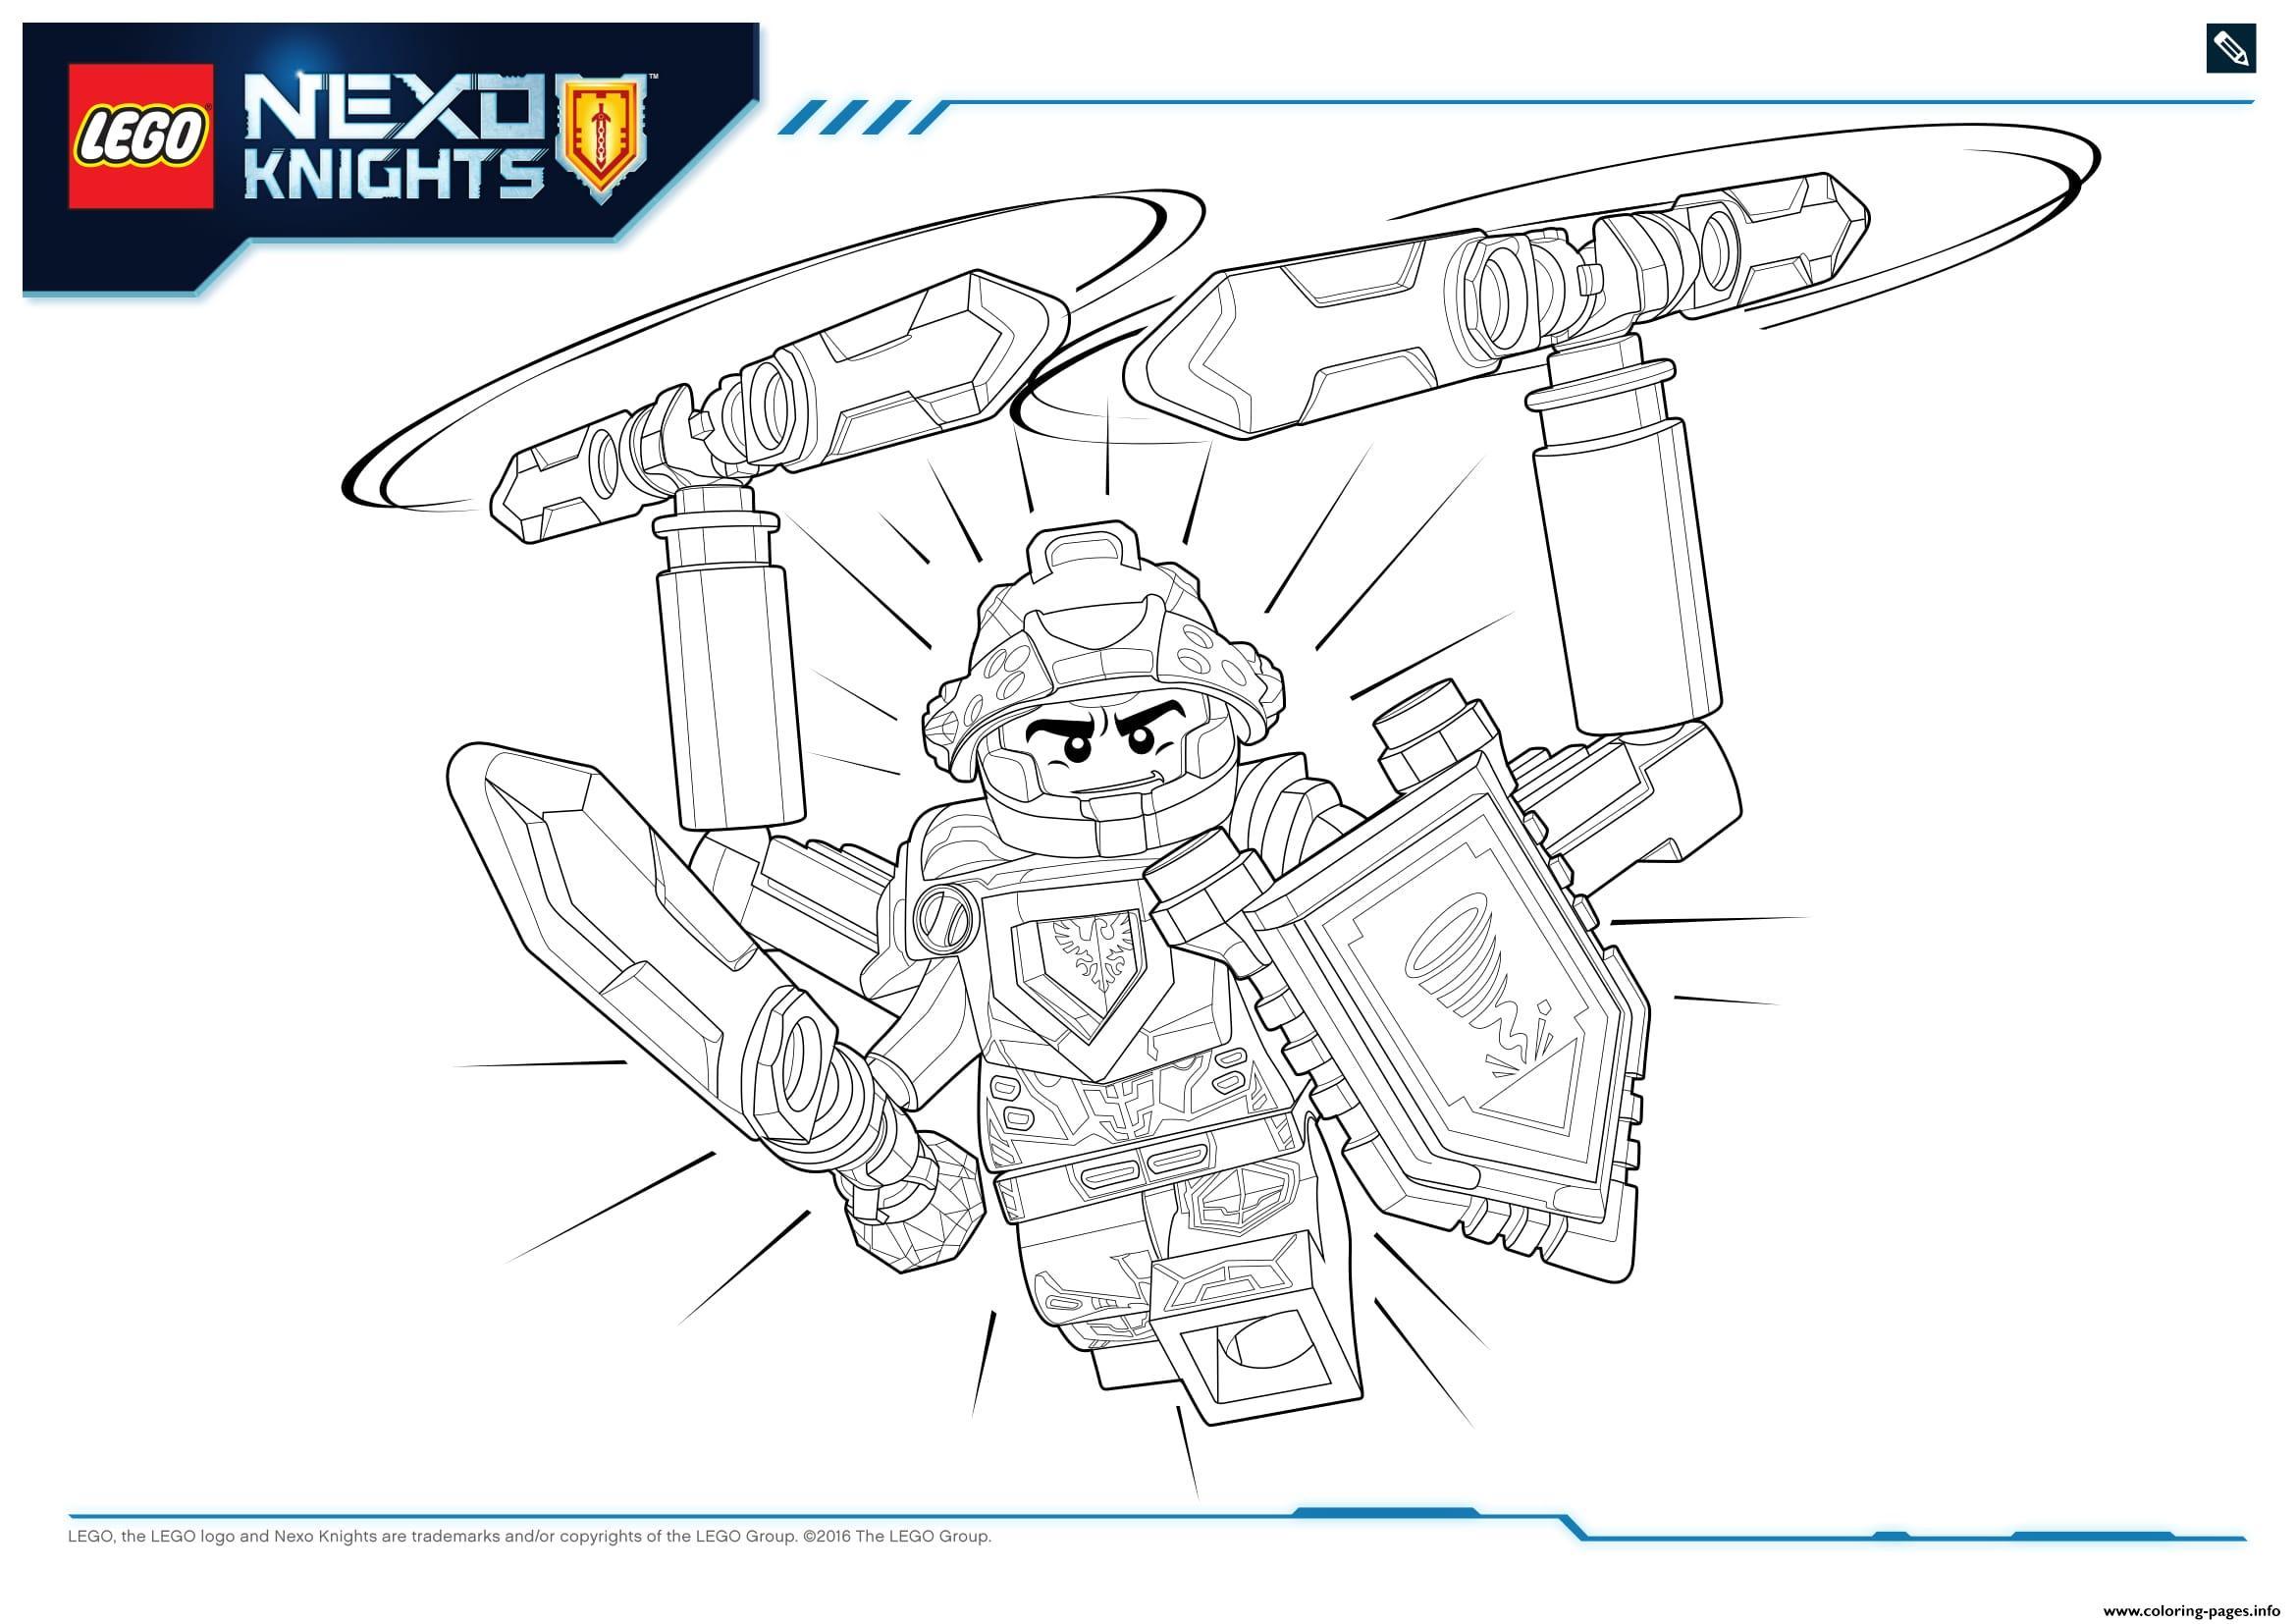 Lego Nexo Knights Ultimate Knights